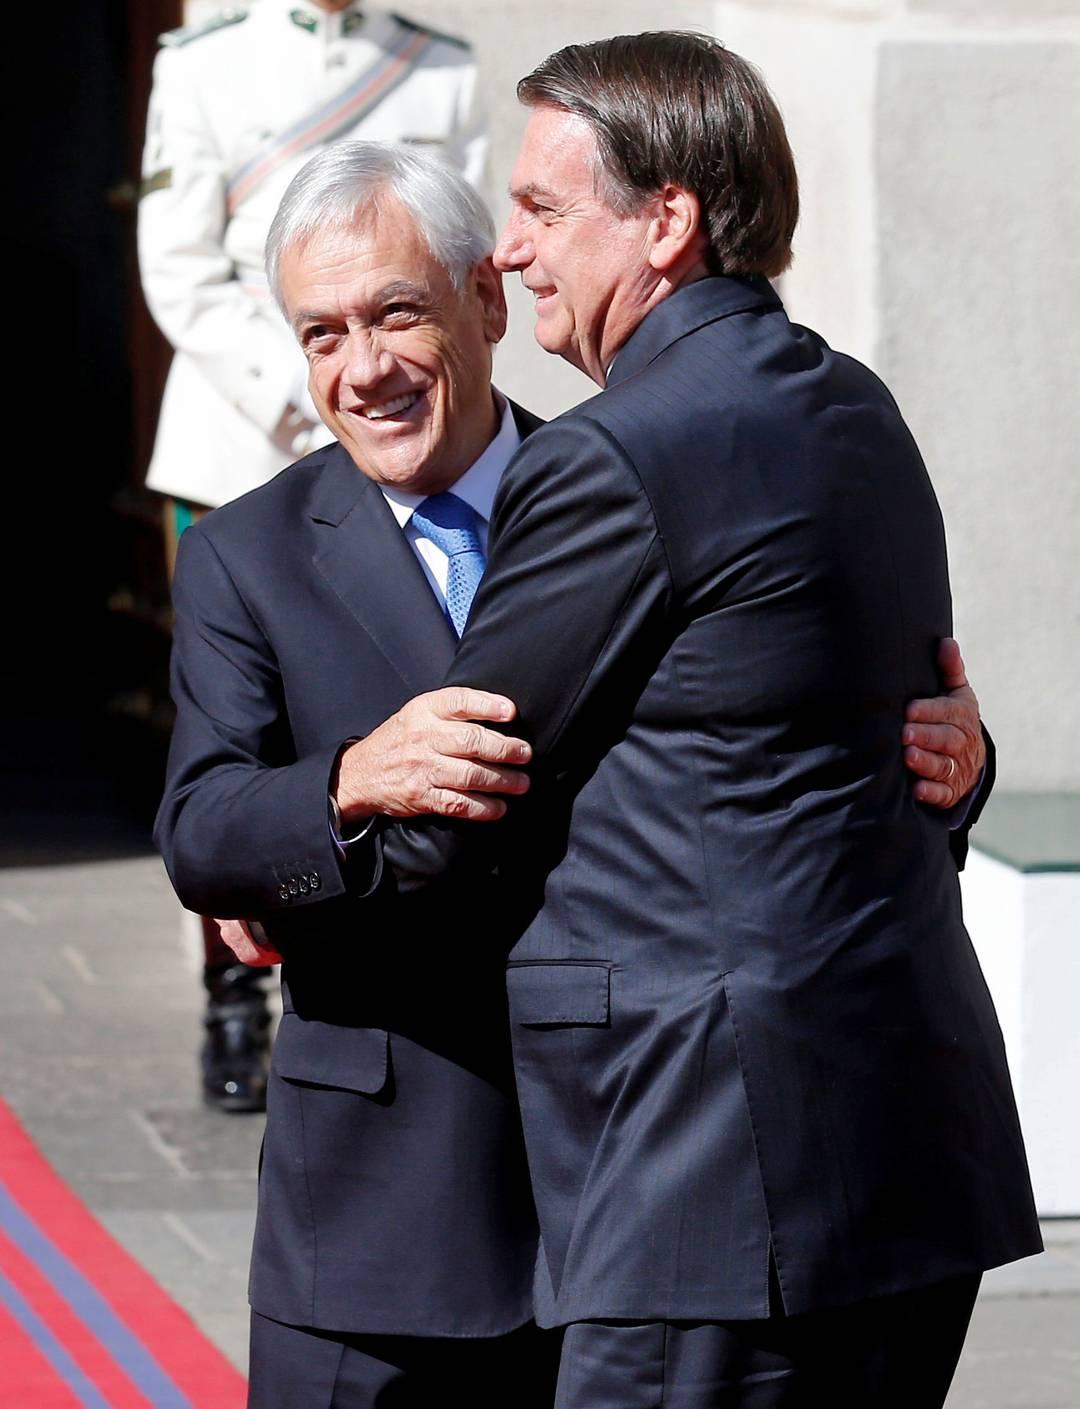 Presidente Jair Bolsonaro abraça president chileno Sebastián Piñera ao chegar ao palácio presidencial La Moneda, em Santiago, no Chile, nesta sexta-feira (22)